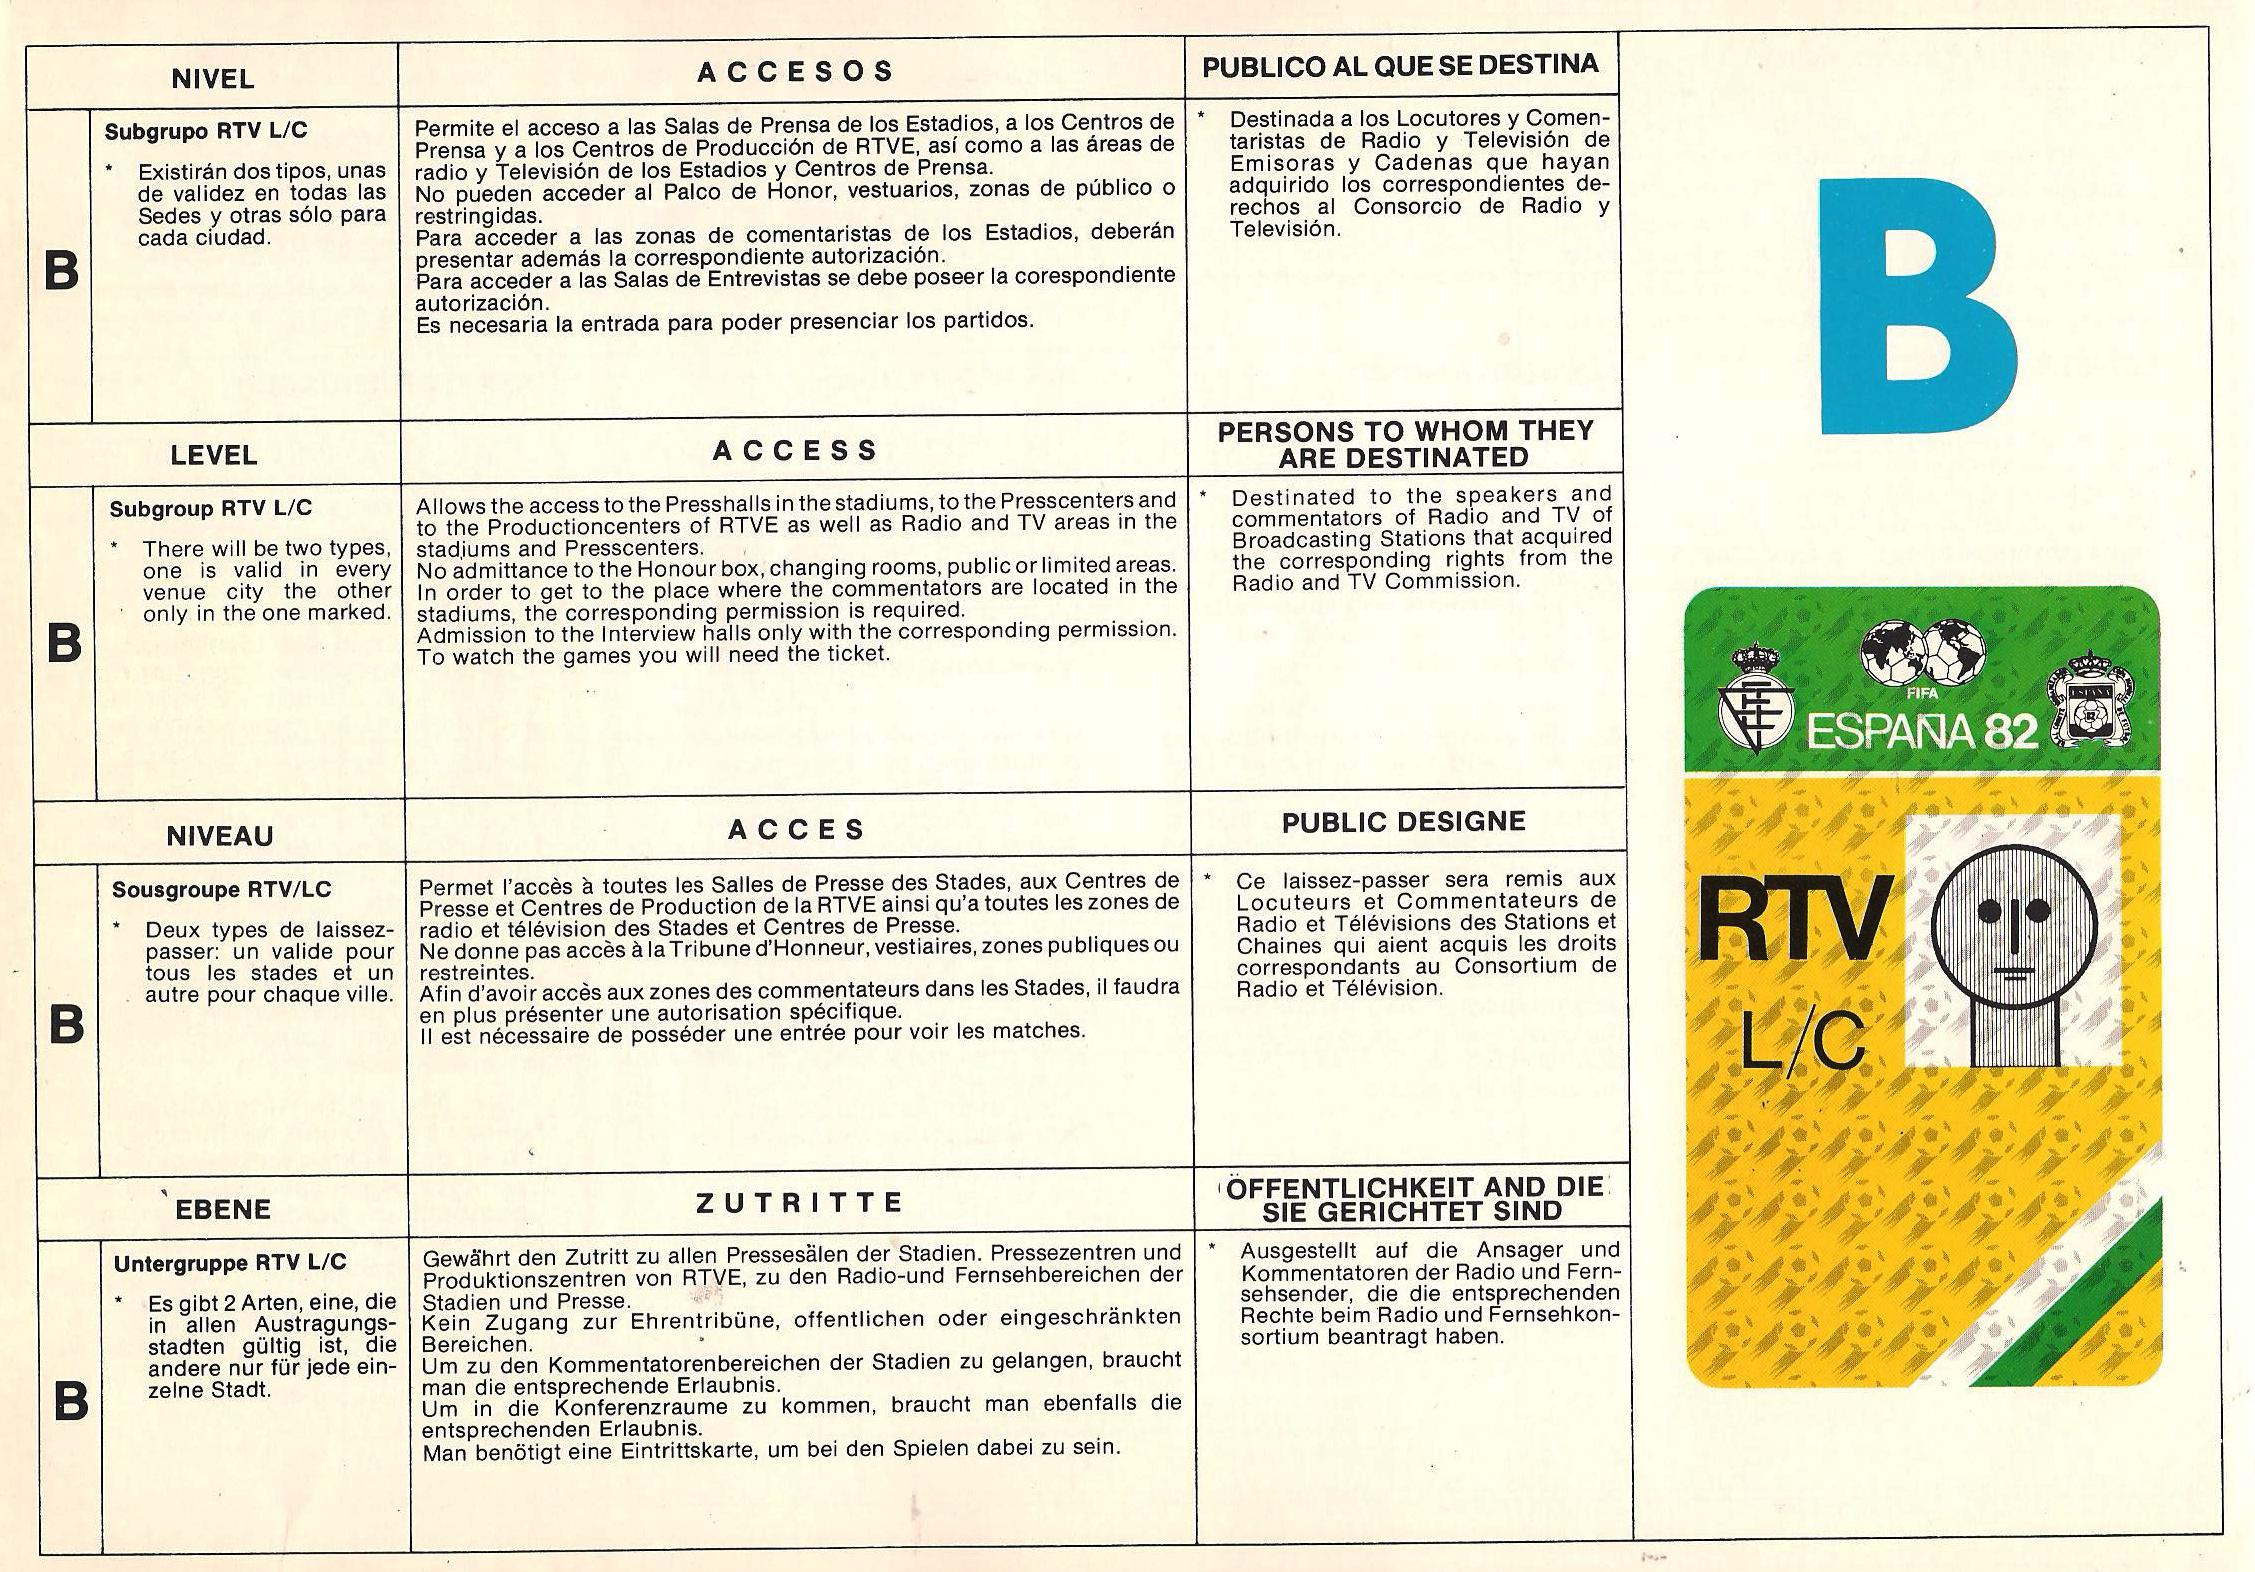 accreditation 1 1982